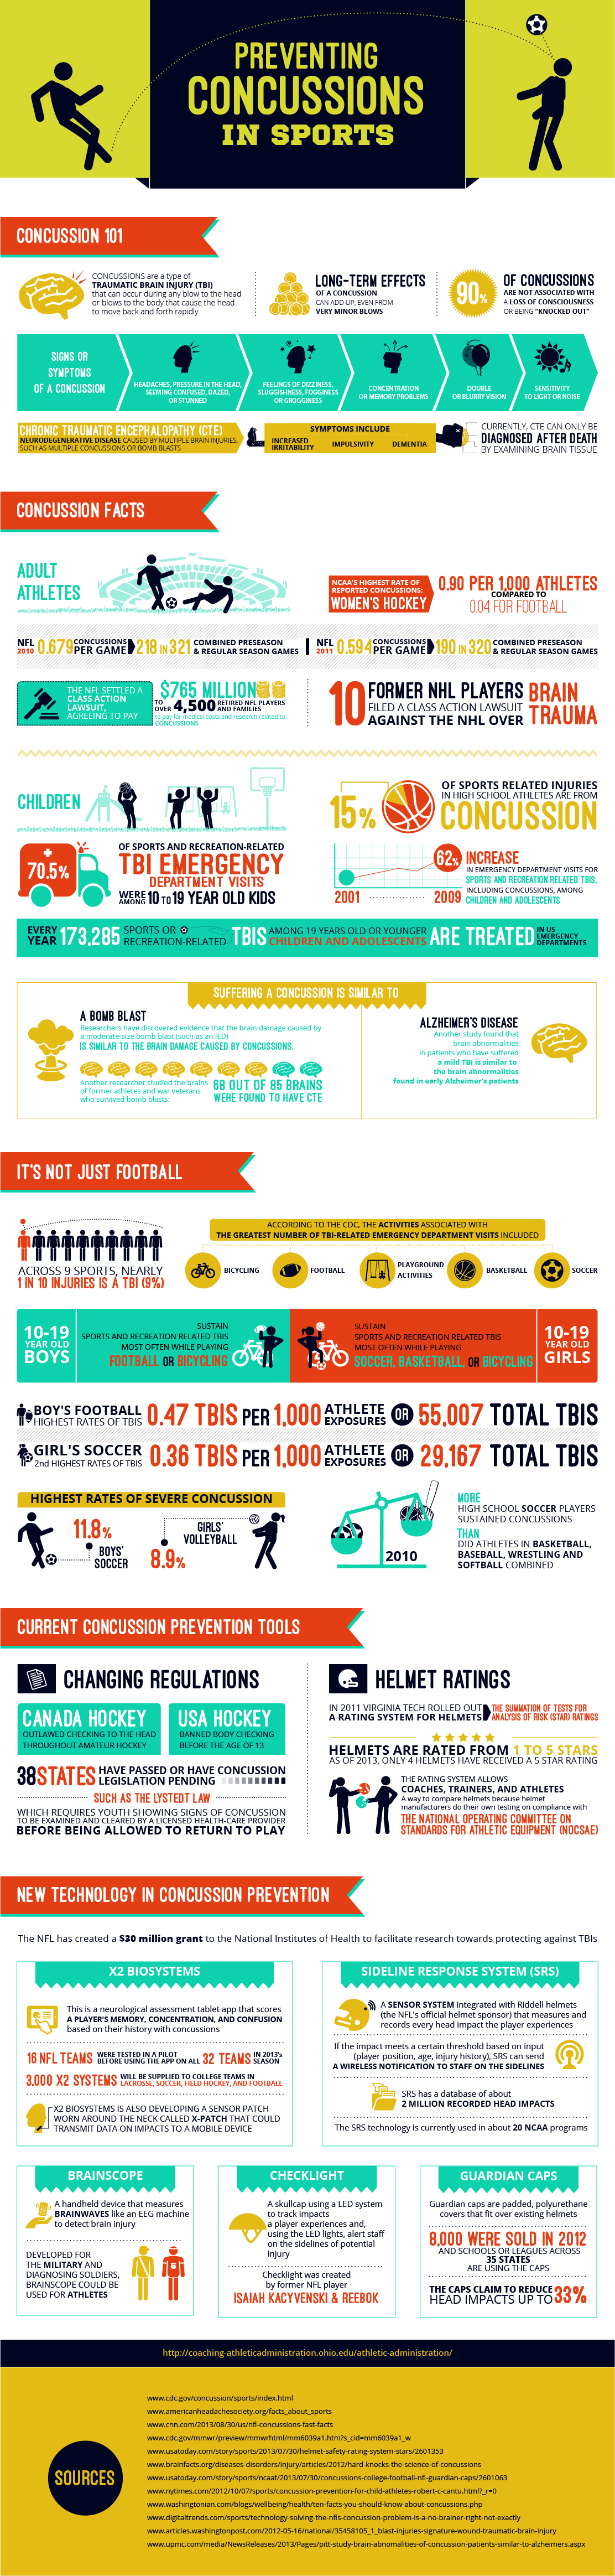 Preventing Concussions in Sports